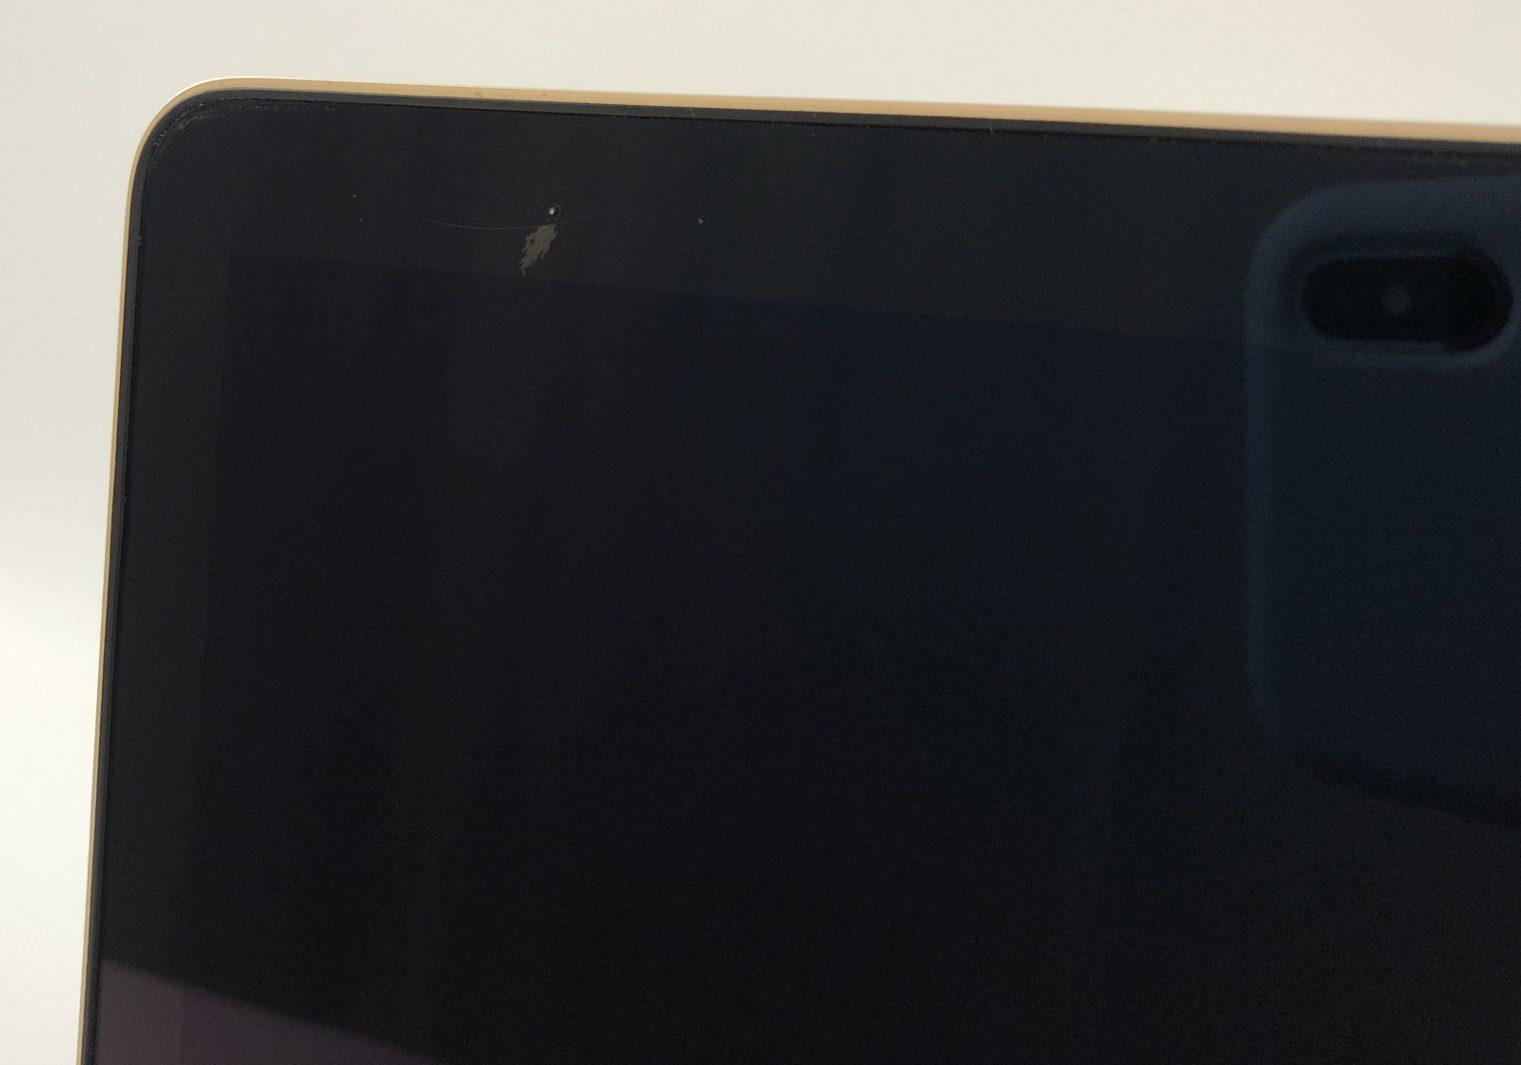 "MacBook 12"" Early 2015 (Intel Core M 1.1 GHz 8 GB RAM 256 GB SSD), Gold, Intel Core M 1.1 GHz, 8 GB RAM, 256 GB SSD, bild 4"